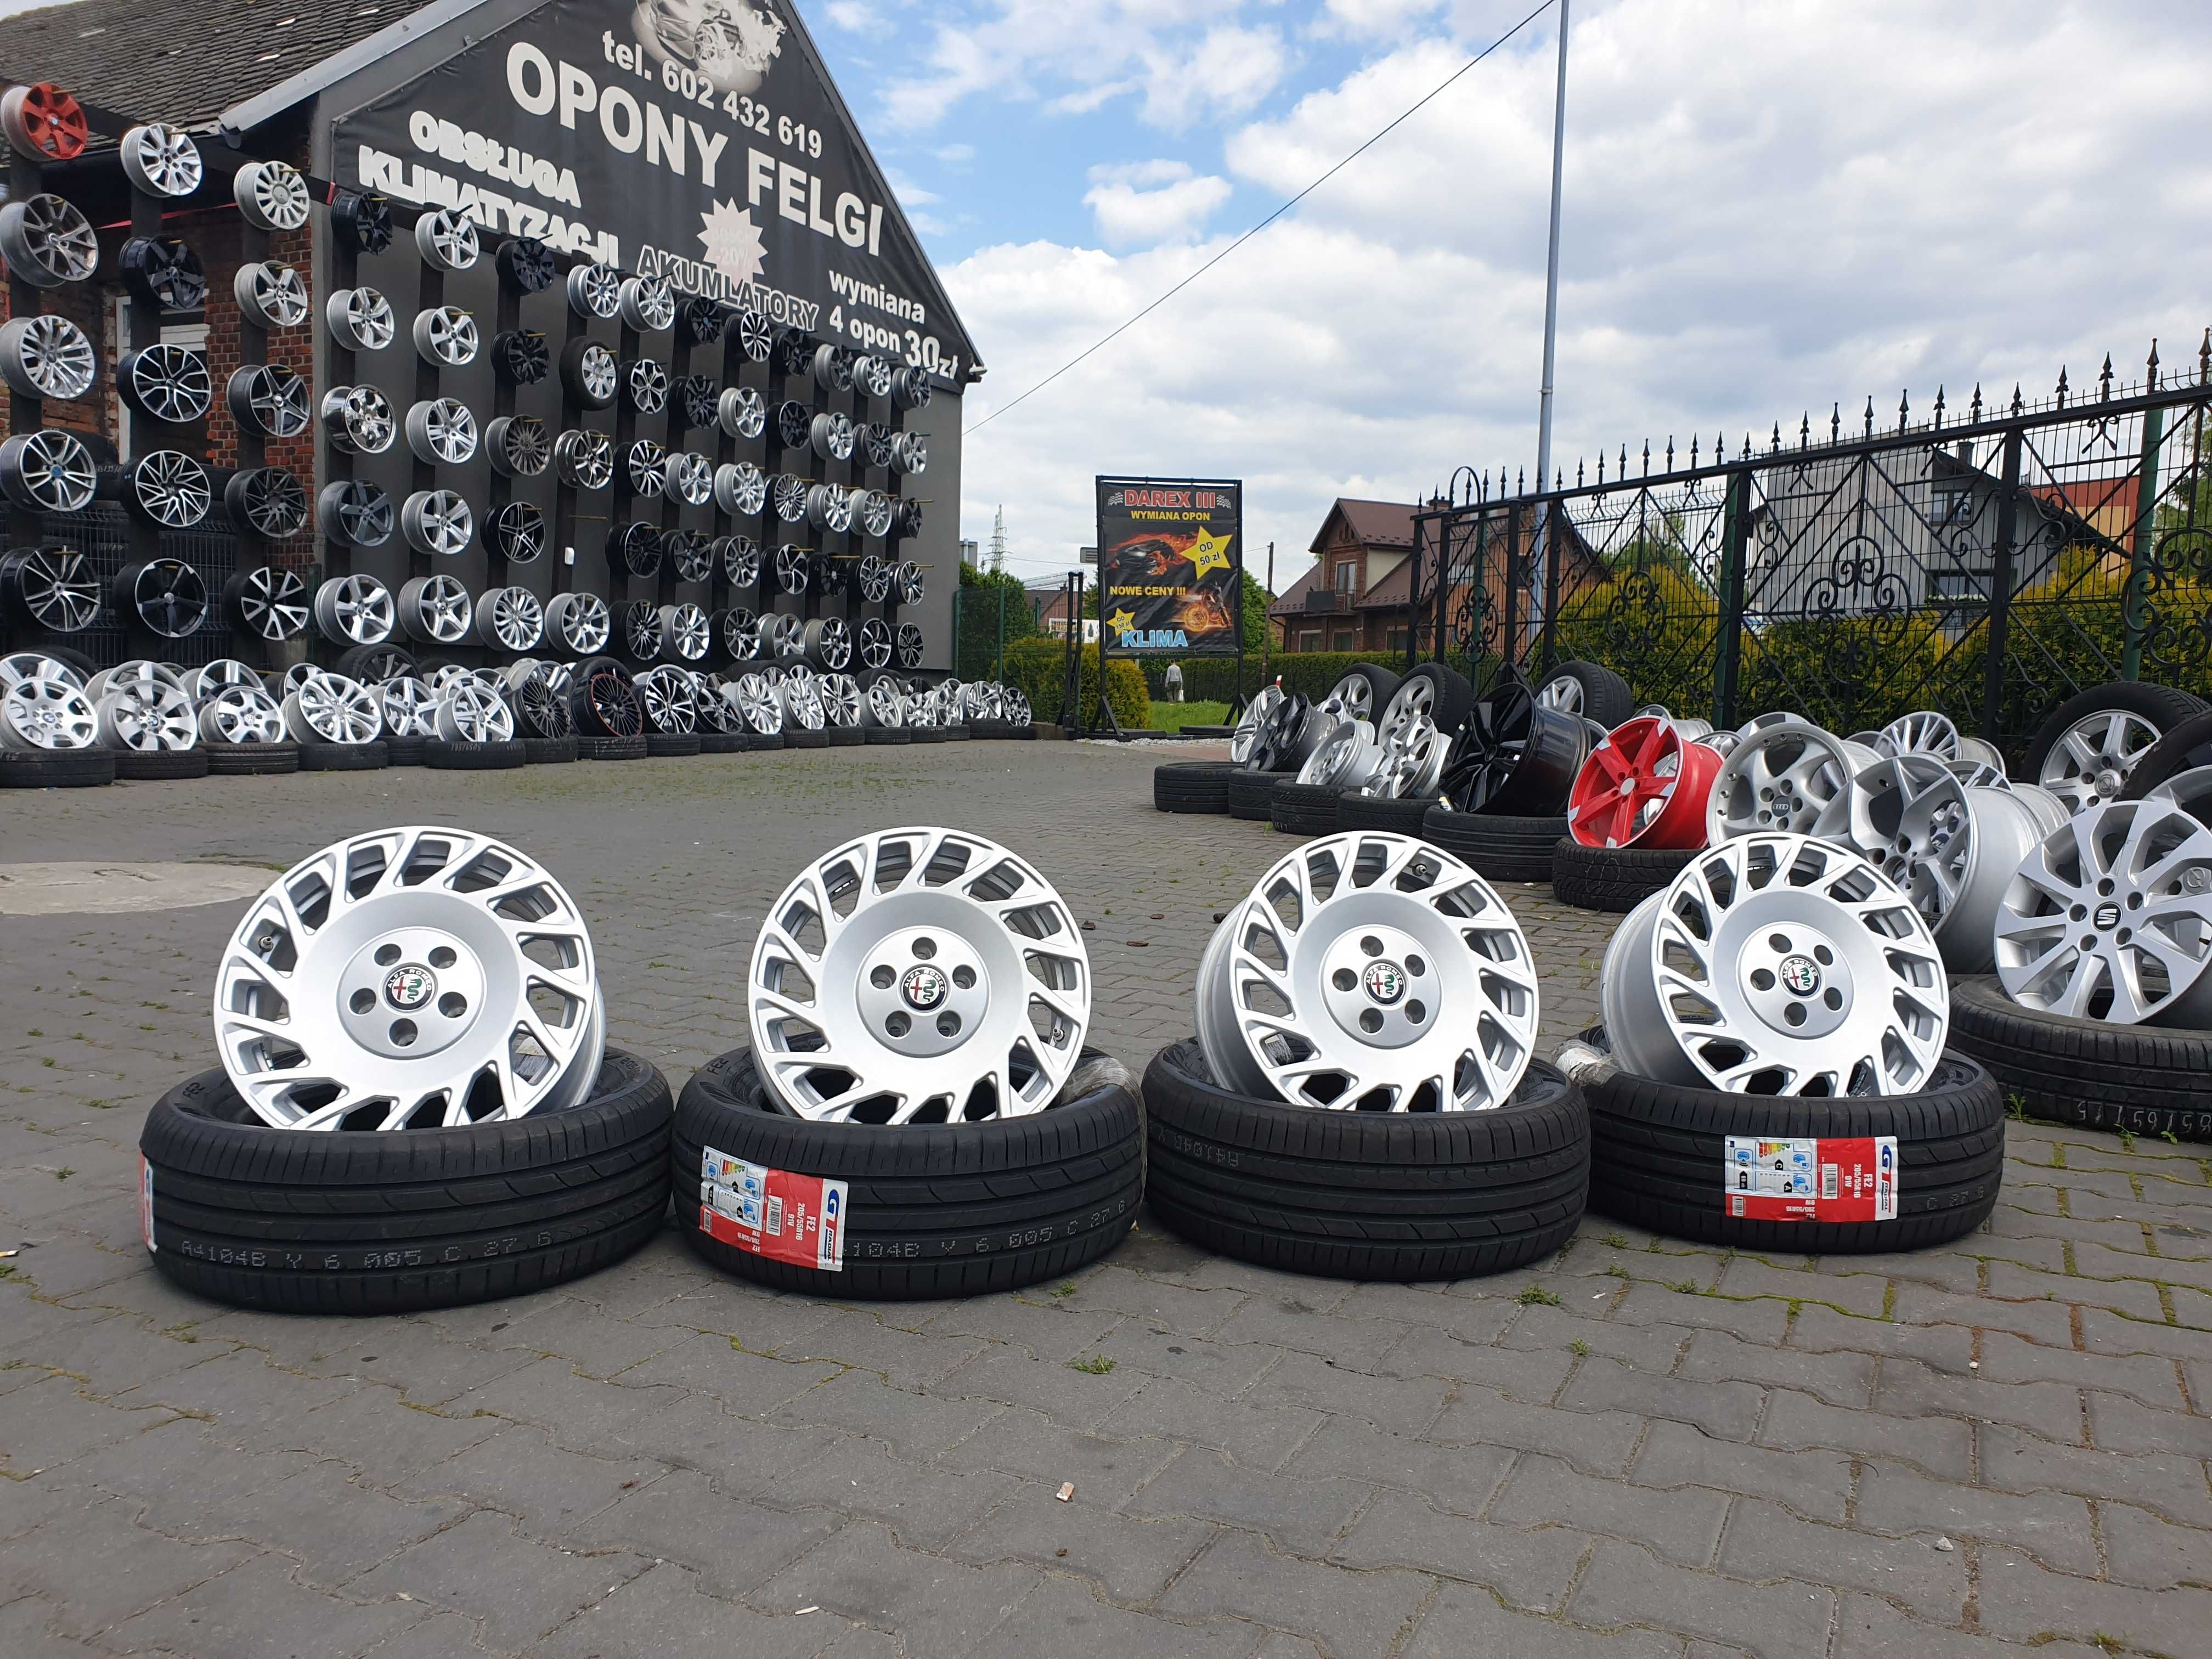 "Felgi aluminiowe 16"" 5x110 7j et25 Alfa Romeo Opel ITP. czujniki"